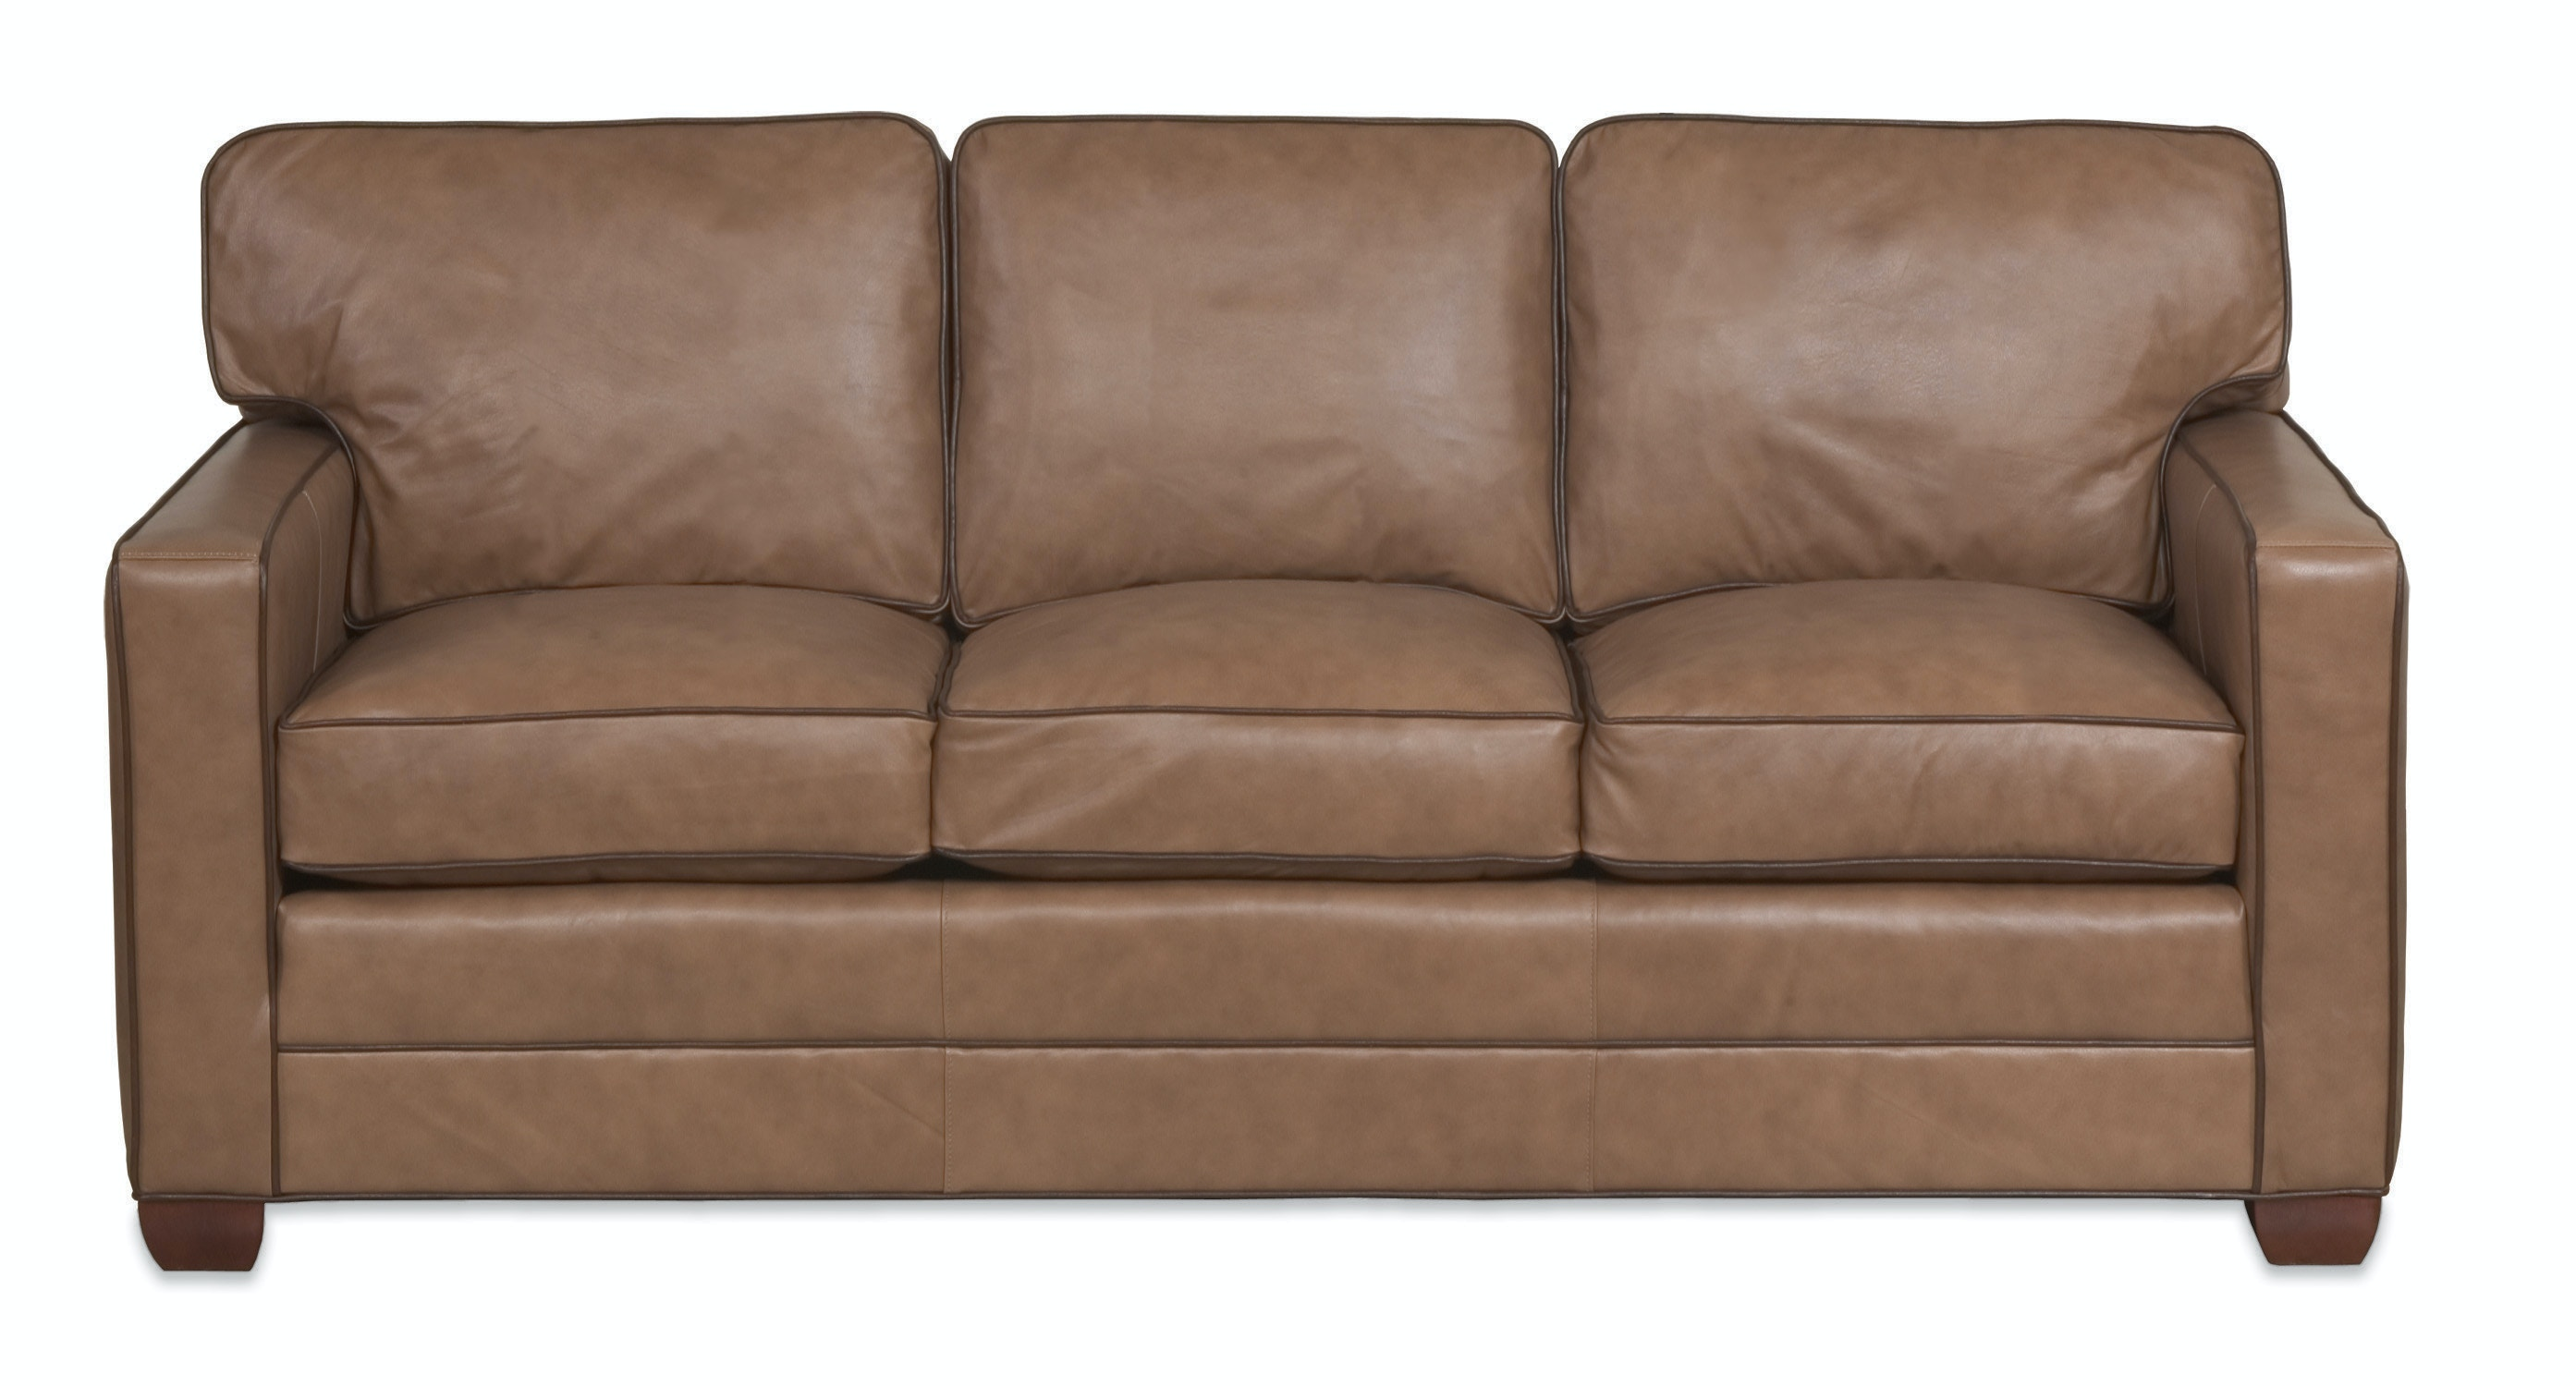 Vanguard Living Room Hillcrest Sofa 600 S   Lenoir Empire Furniture    Johnson City, TN